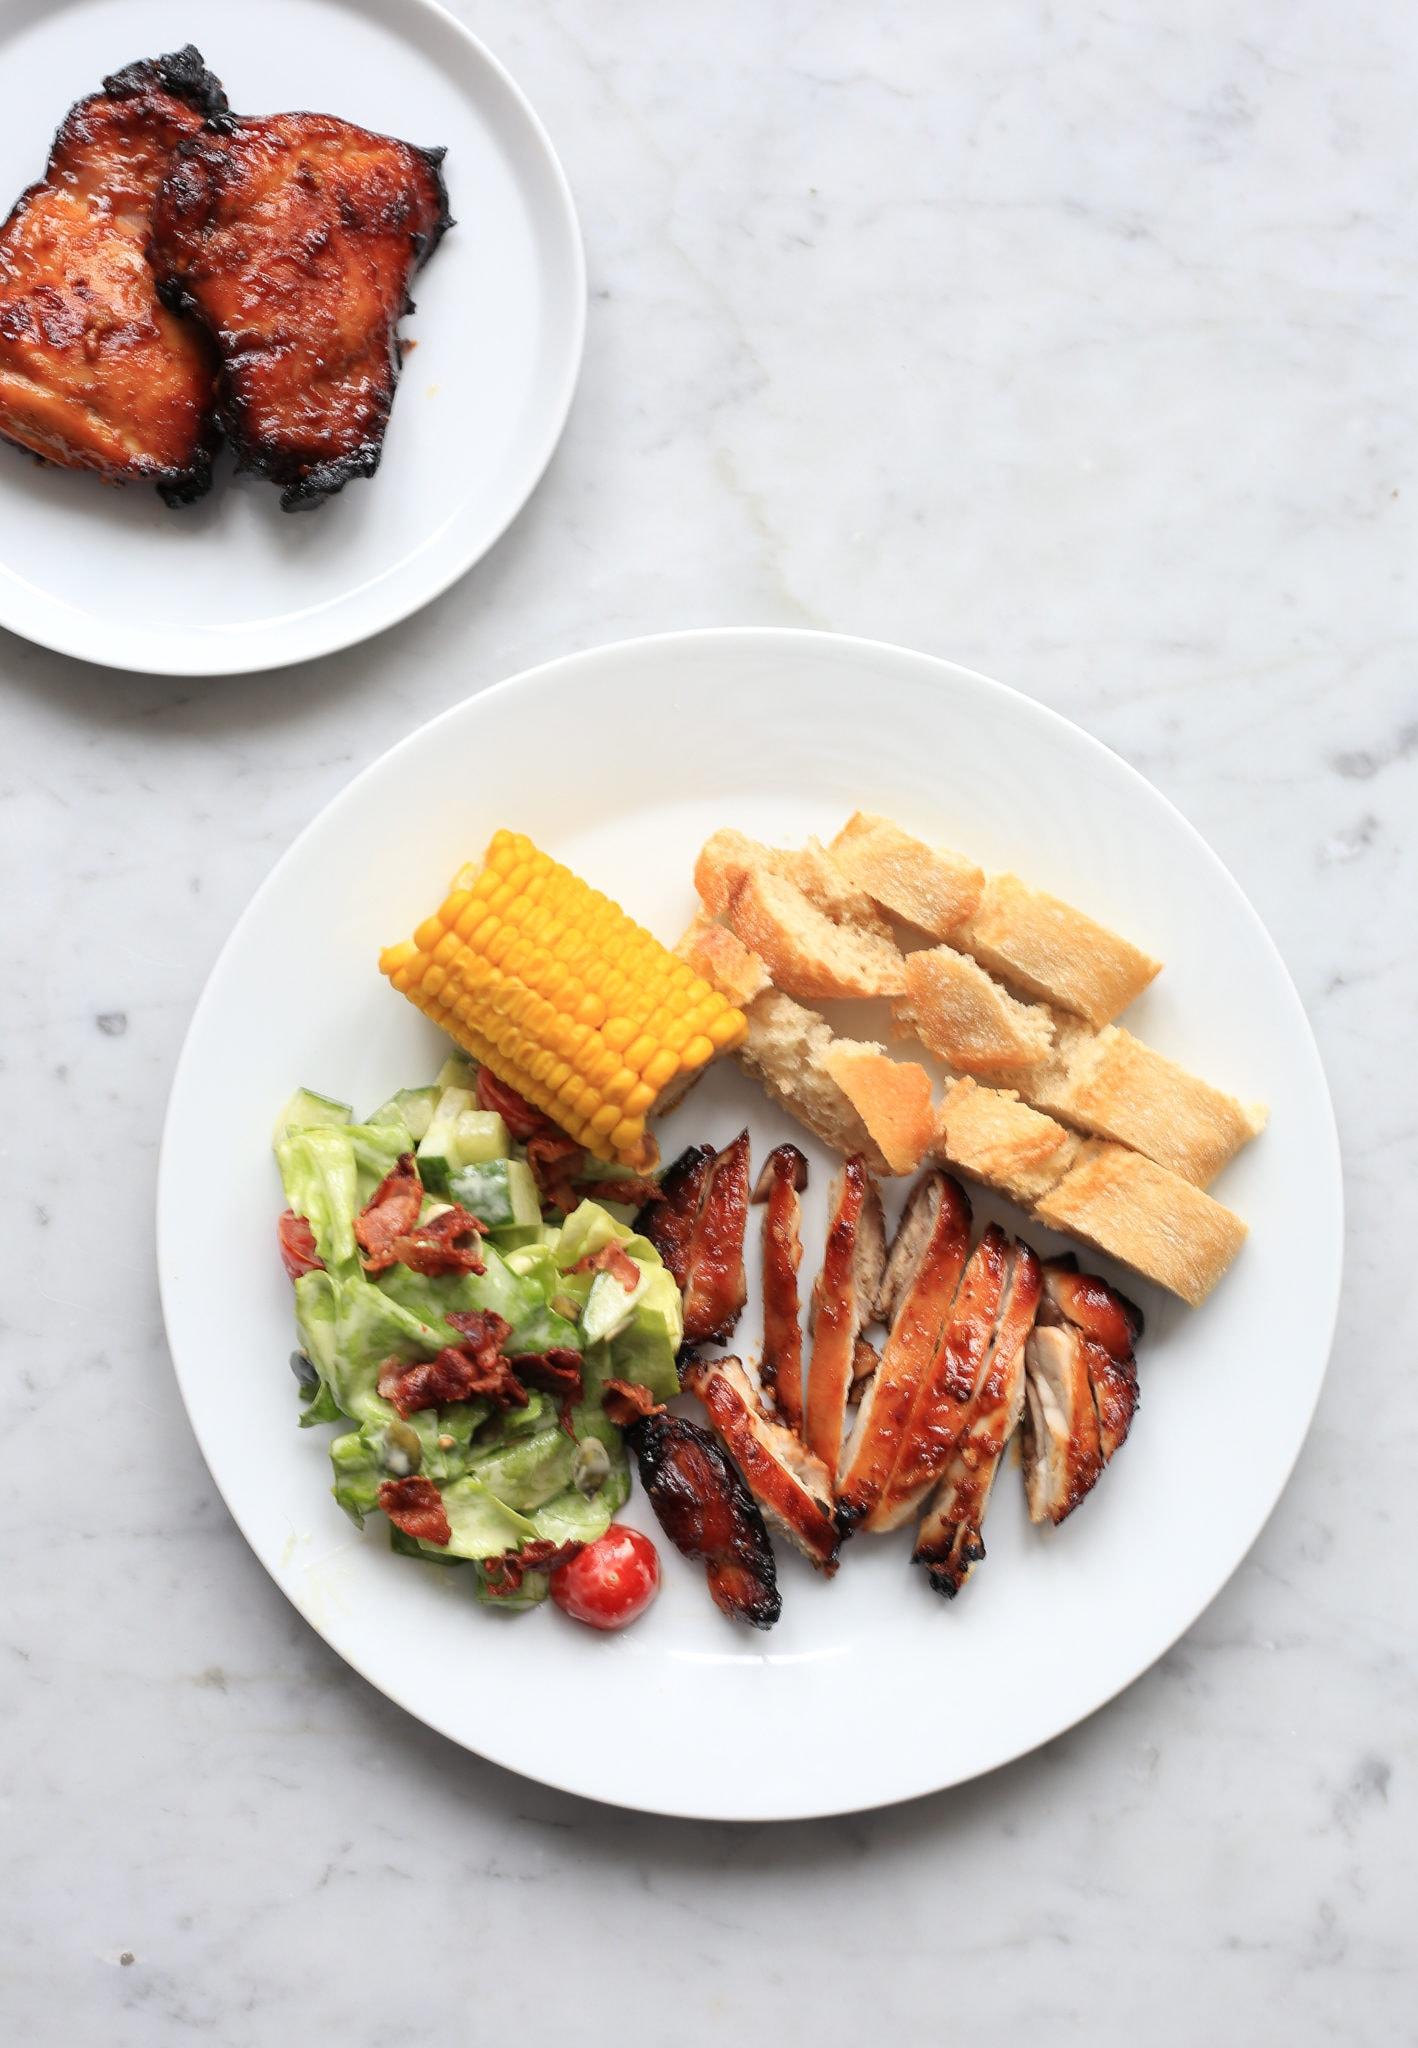 Chrissy Teigen Cravings e1504470086899 - Recept Chipotle honing kip + Kookboek review Cravings van Chrissy Teigen